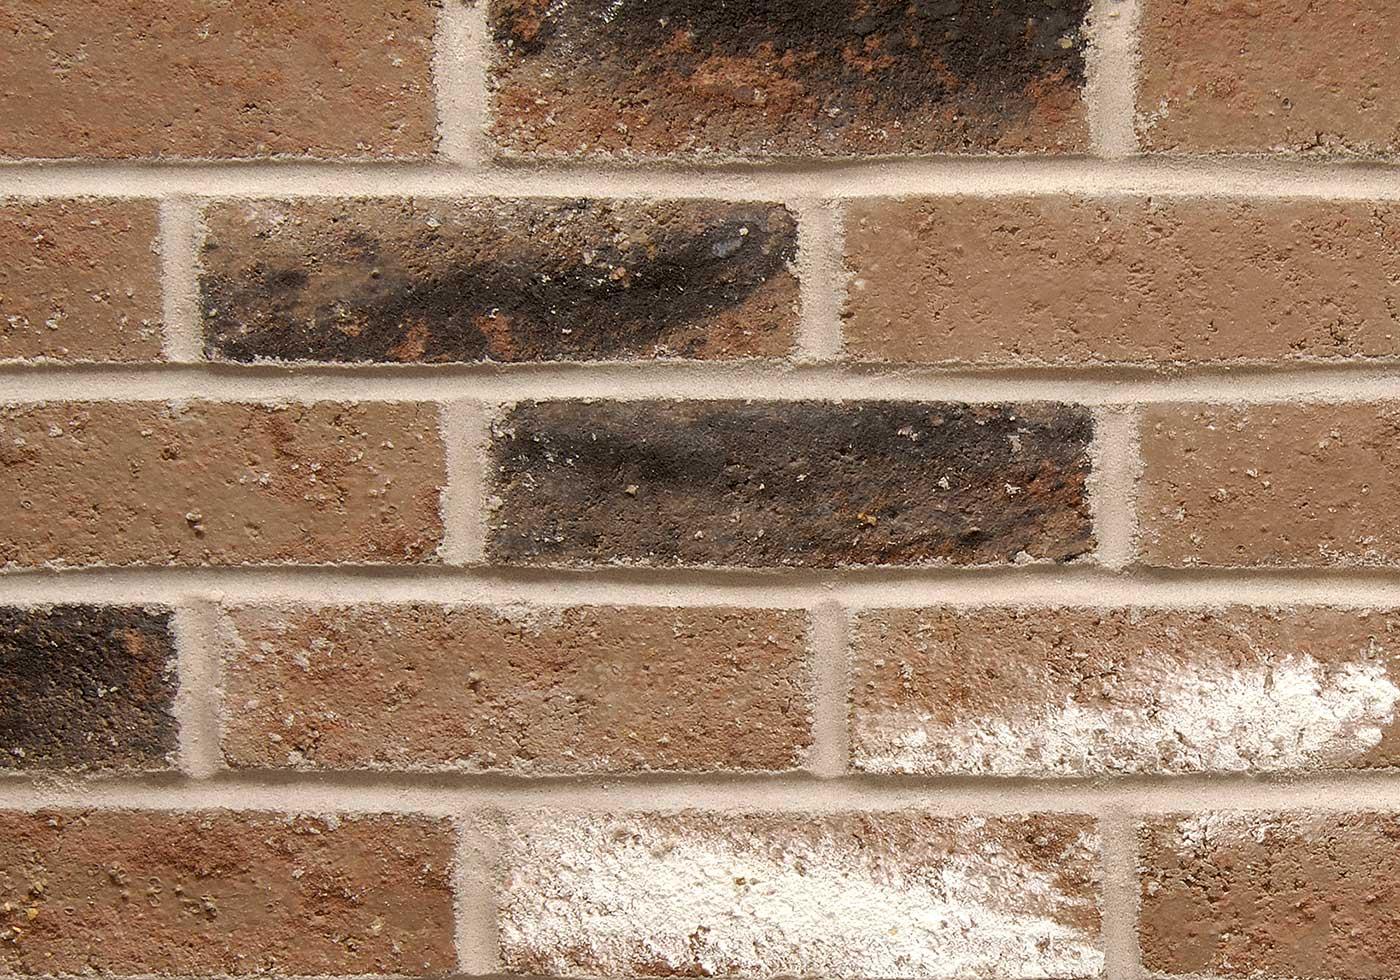 Westfield brick close-up